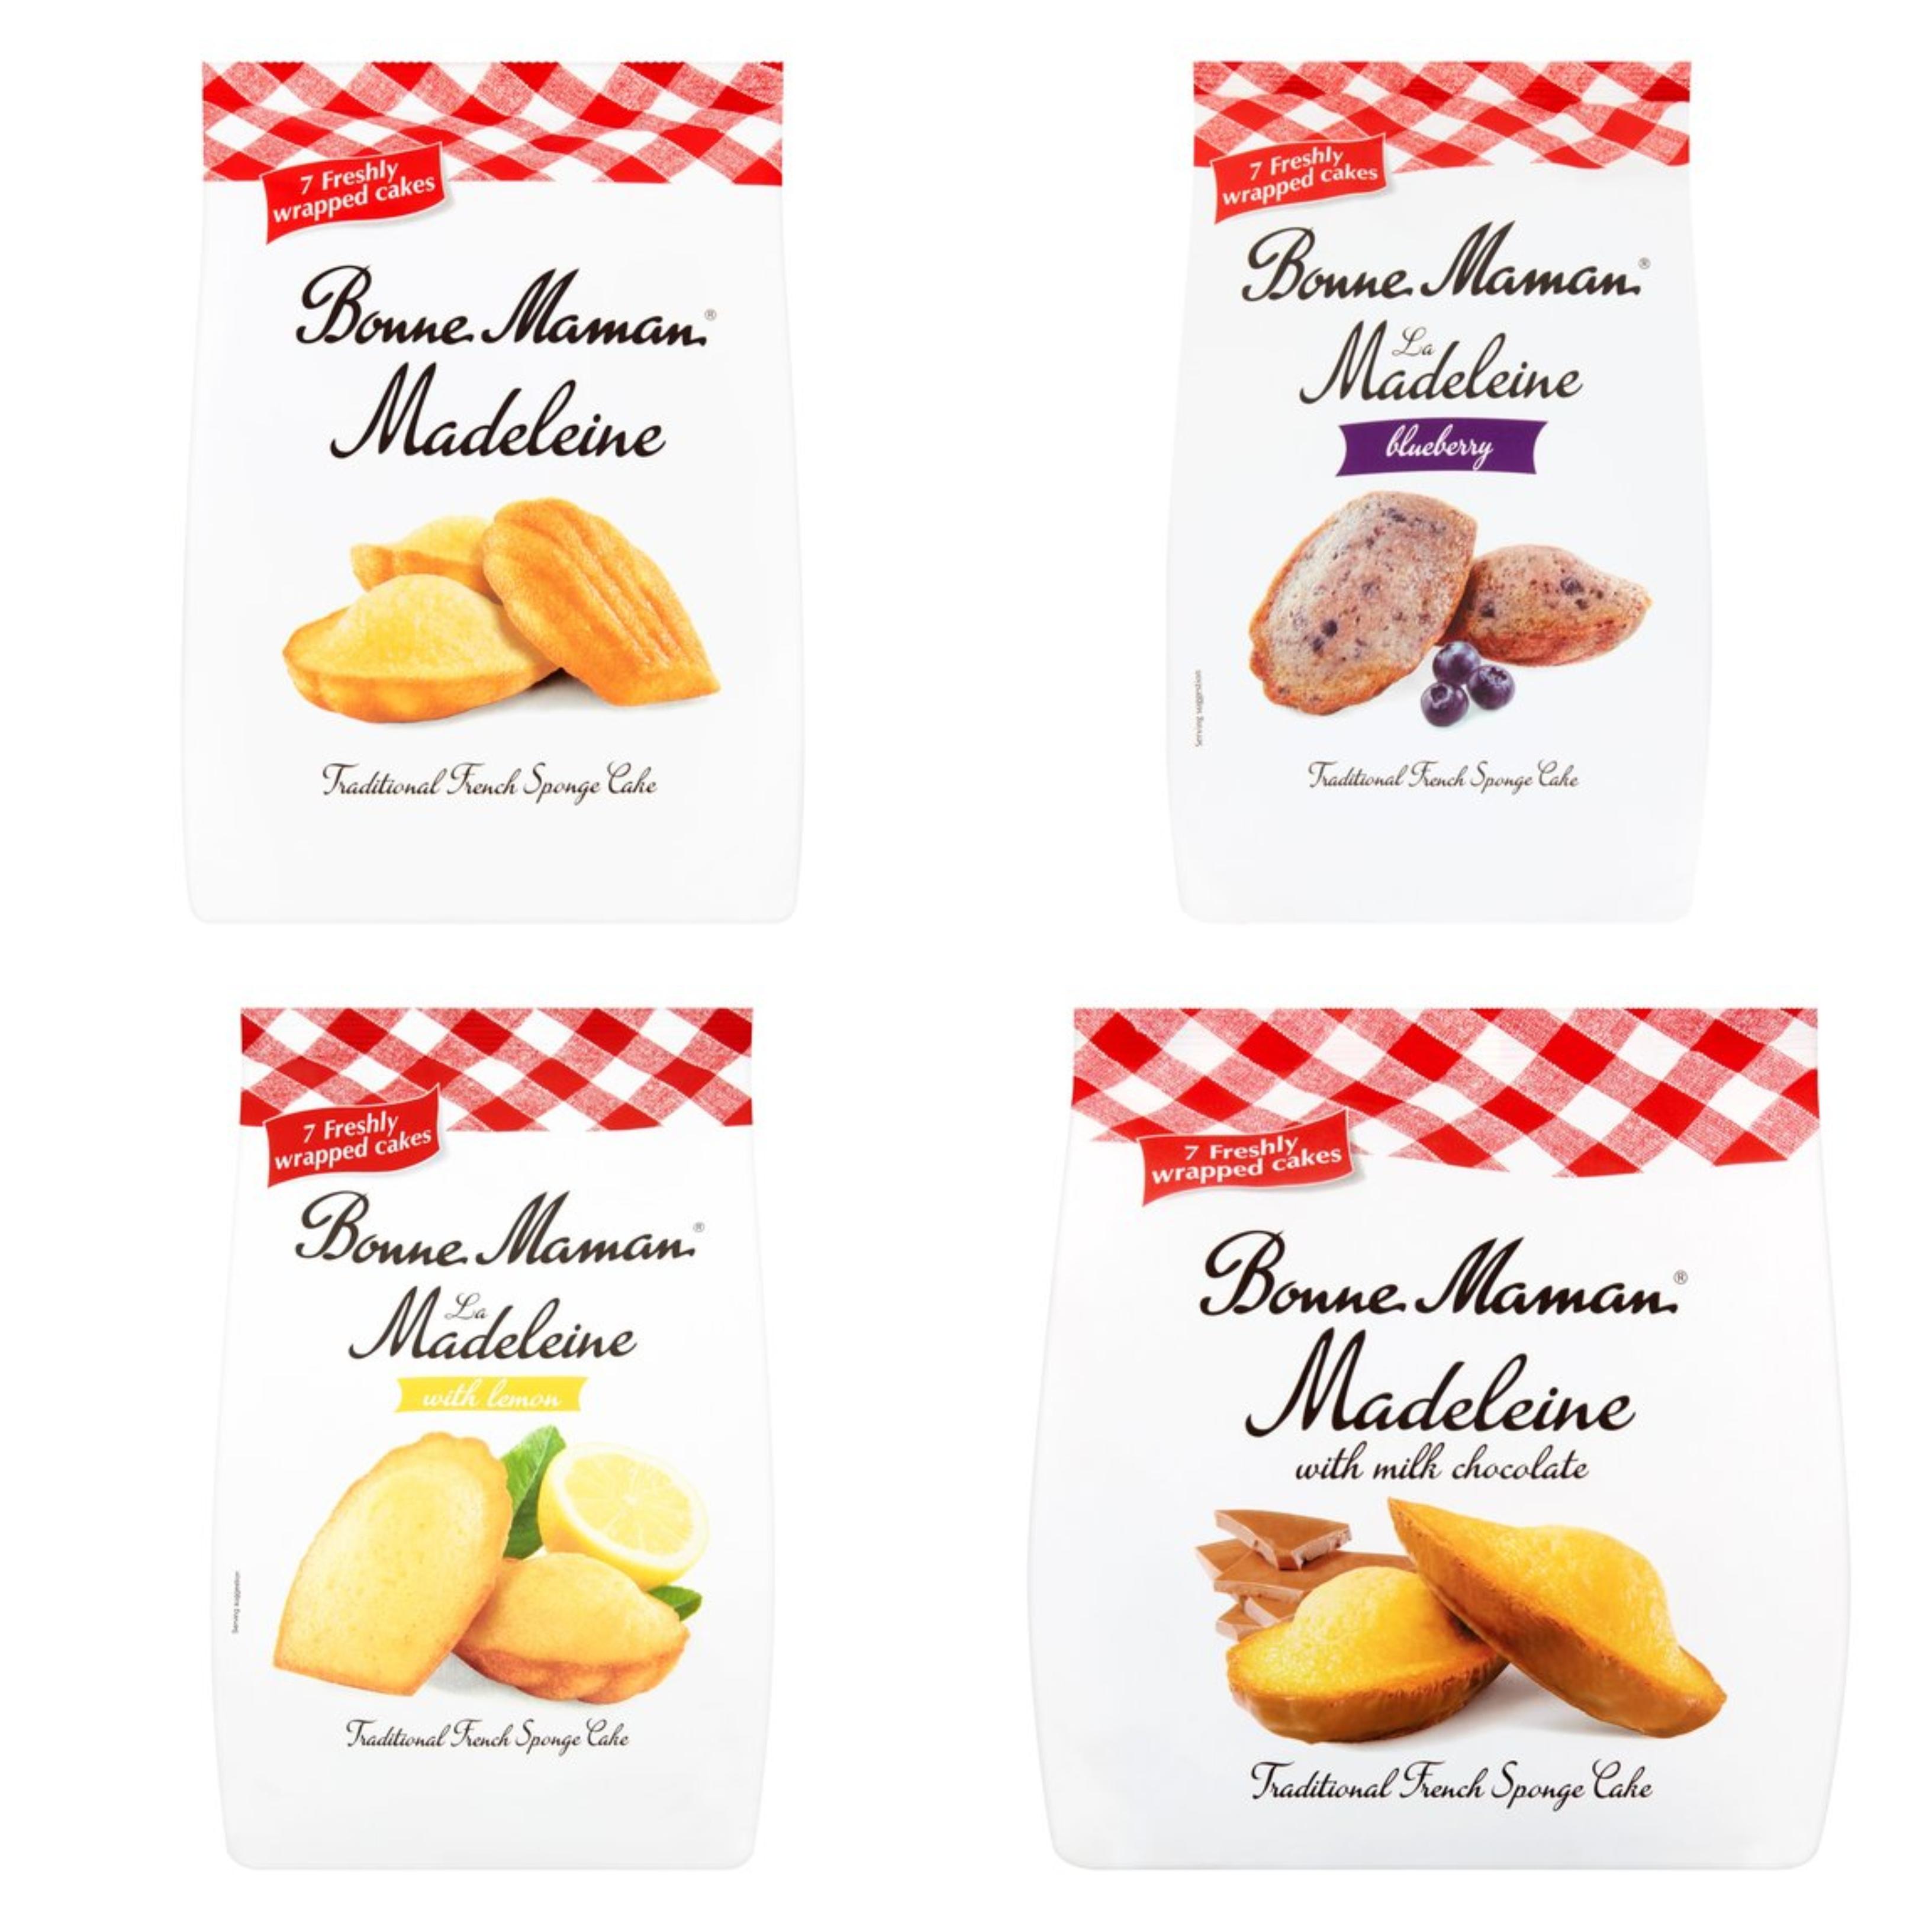 Bonne Maman La Madeleine / Chocolate / Blueberry / Lemon Madeleine 7 Pack - £1.50 @ Tesco